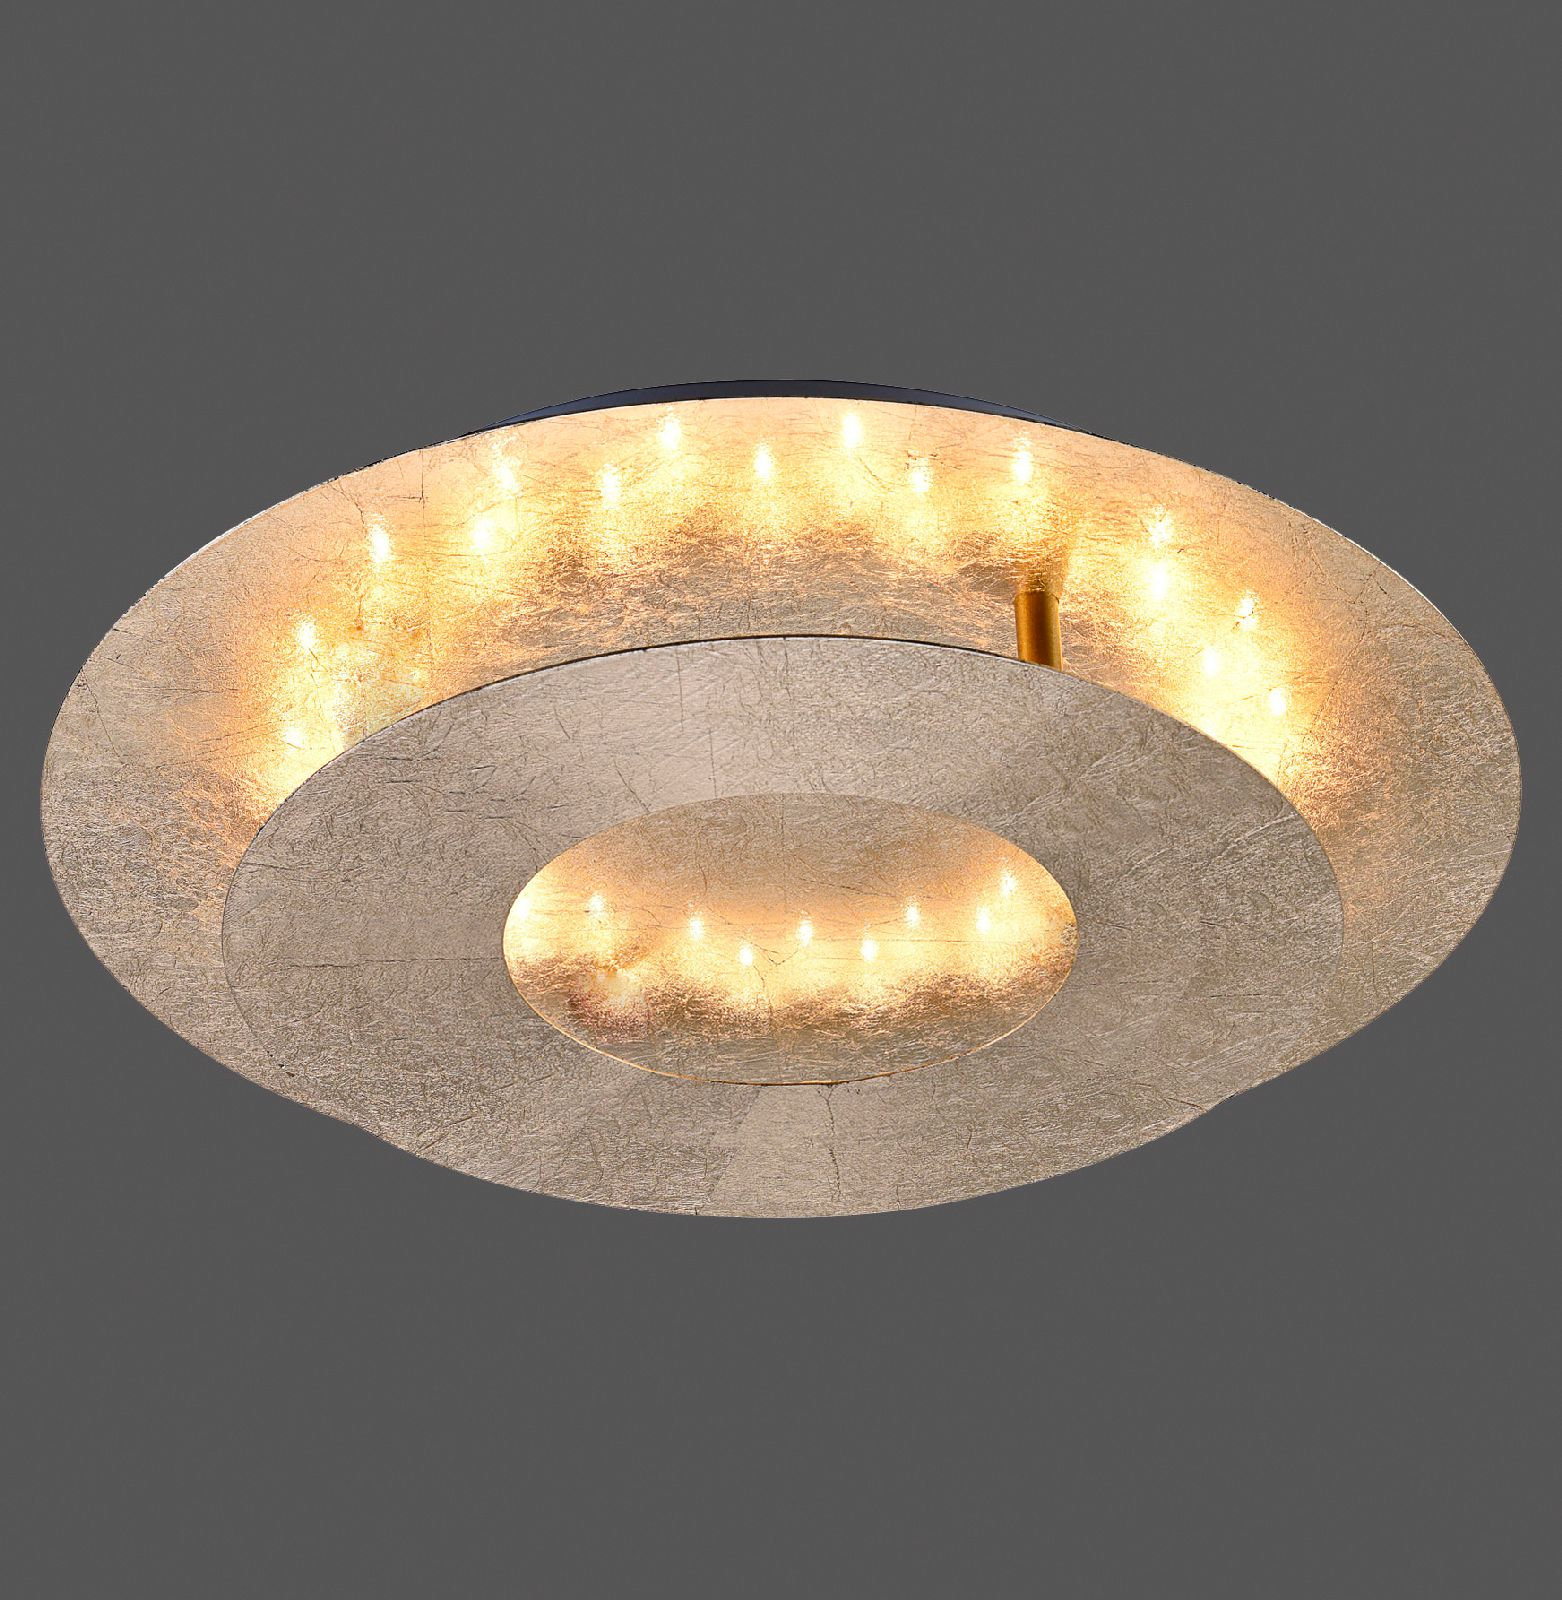 Wunderbar ... LED Wandleuchte Paul Neuhaus Deckenlampe Nevis 9011 12